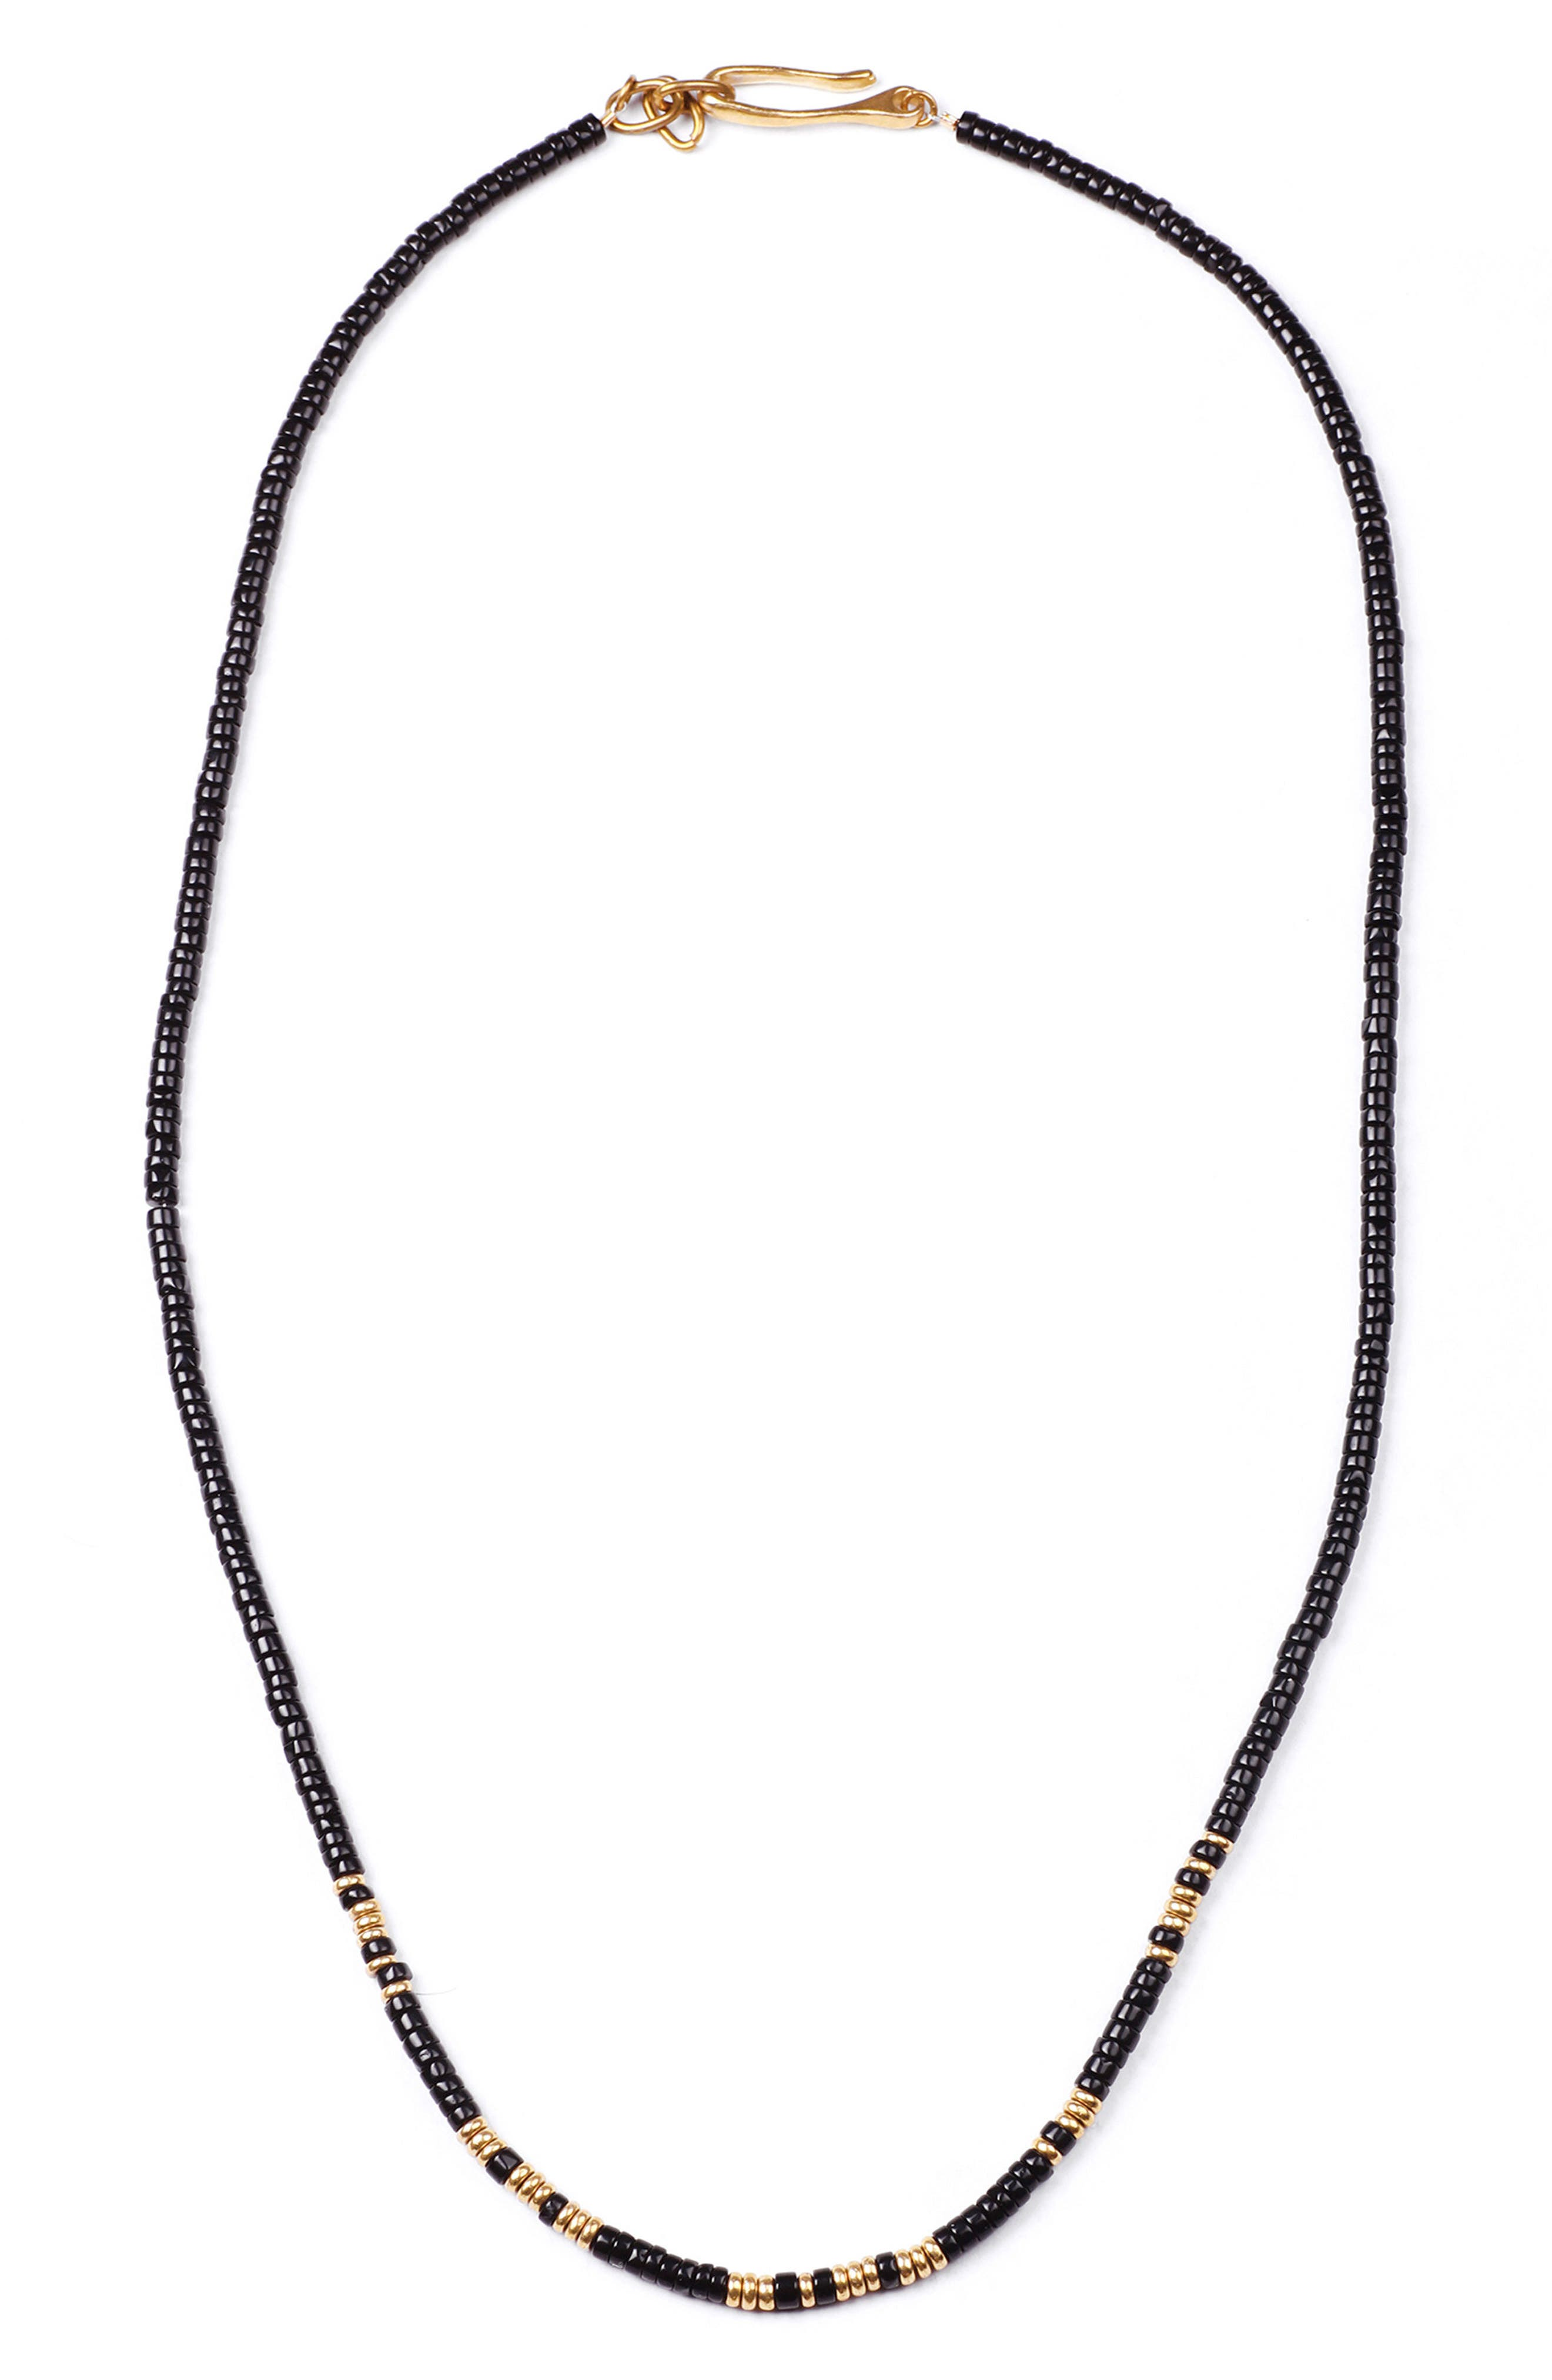 Loyal Morse Beaded Necklace,                             Main thumbnail 1, color,                             001